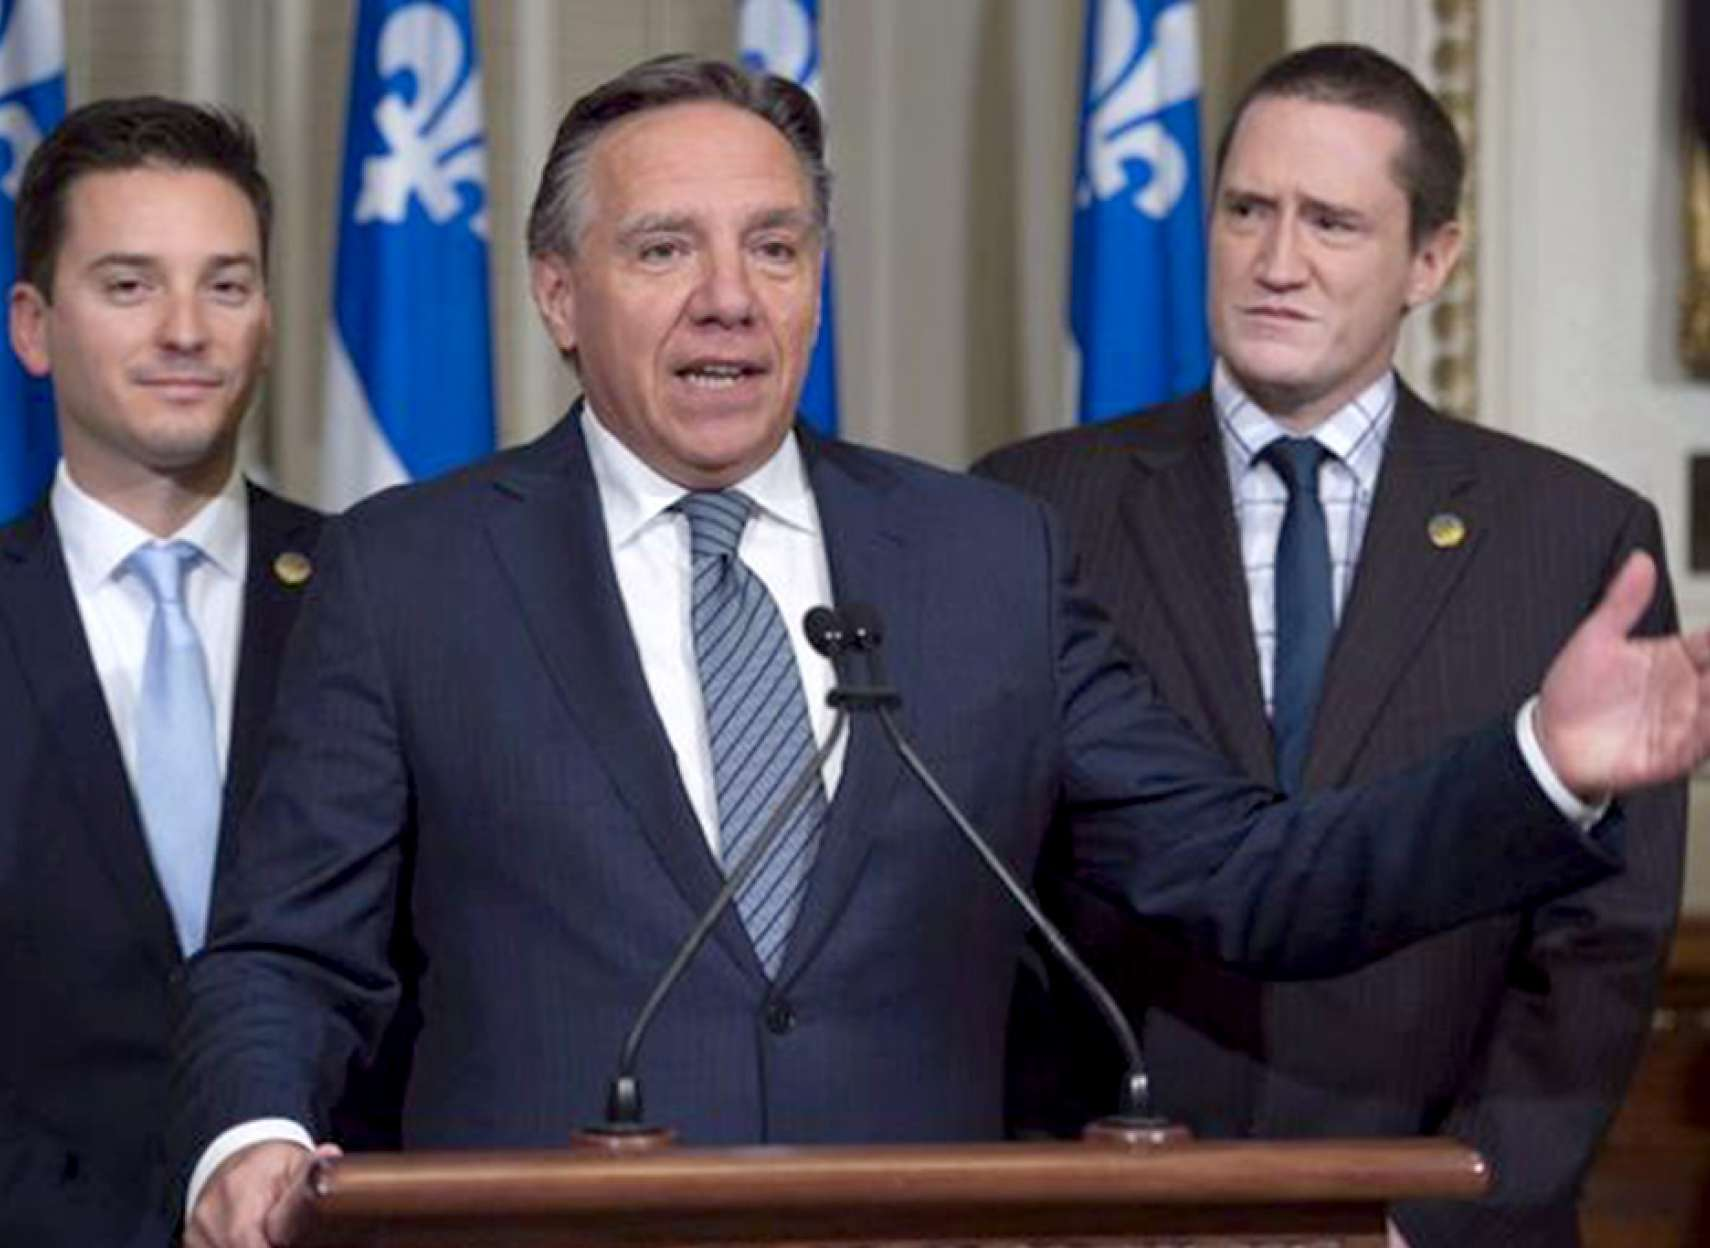 اخبار-کانادا-کبک-امسال-مهاجران-کمتری-میگیرد